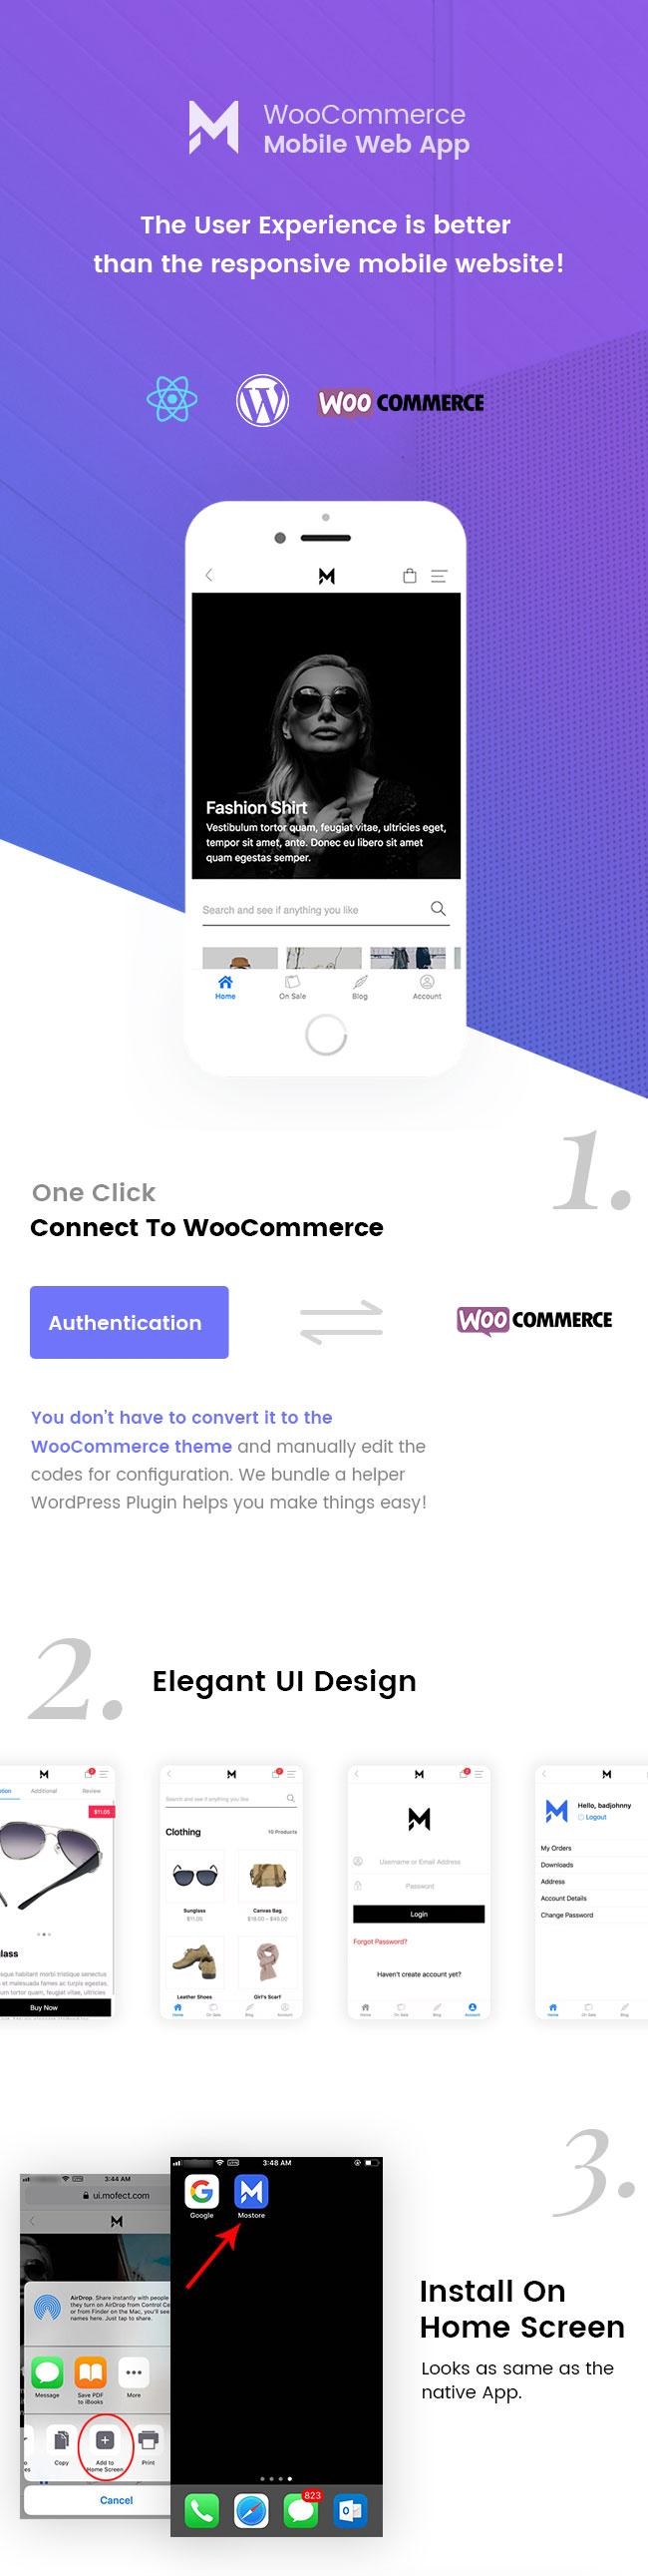 Mostore - WooCommerce Mobile Progressive Web App - 2